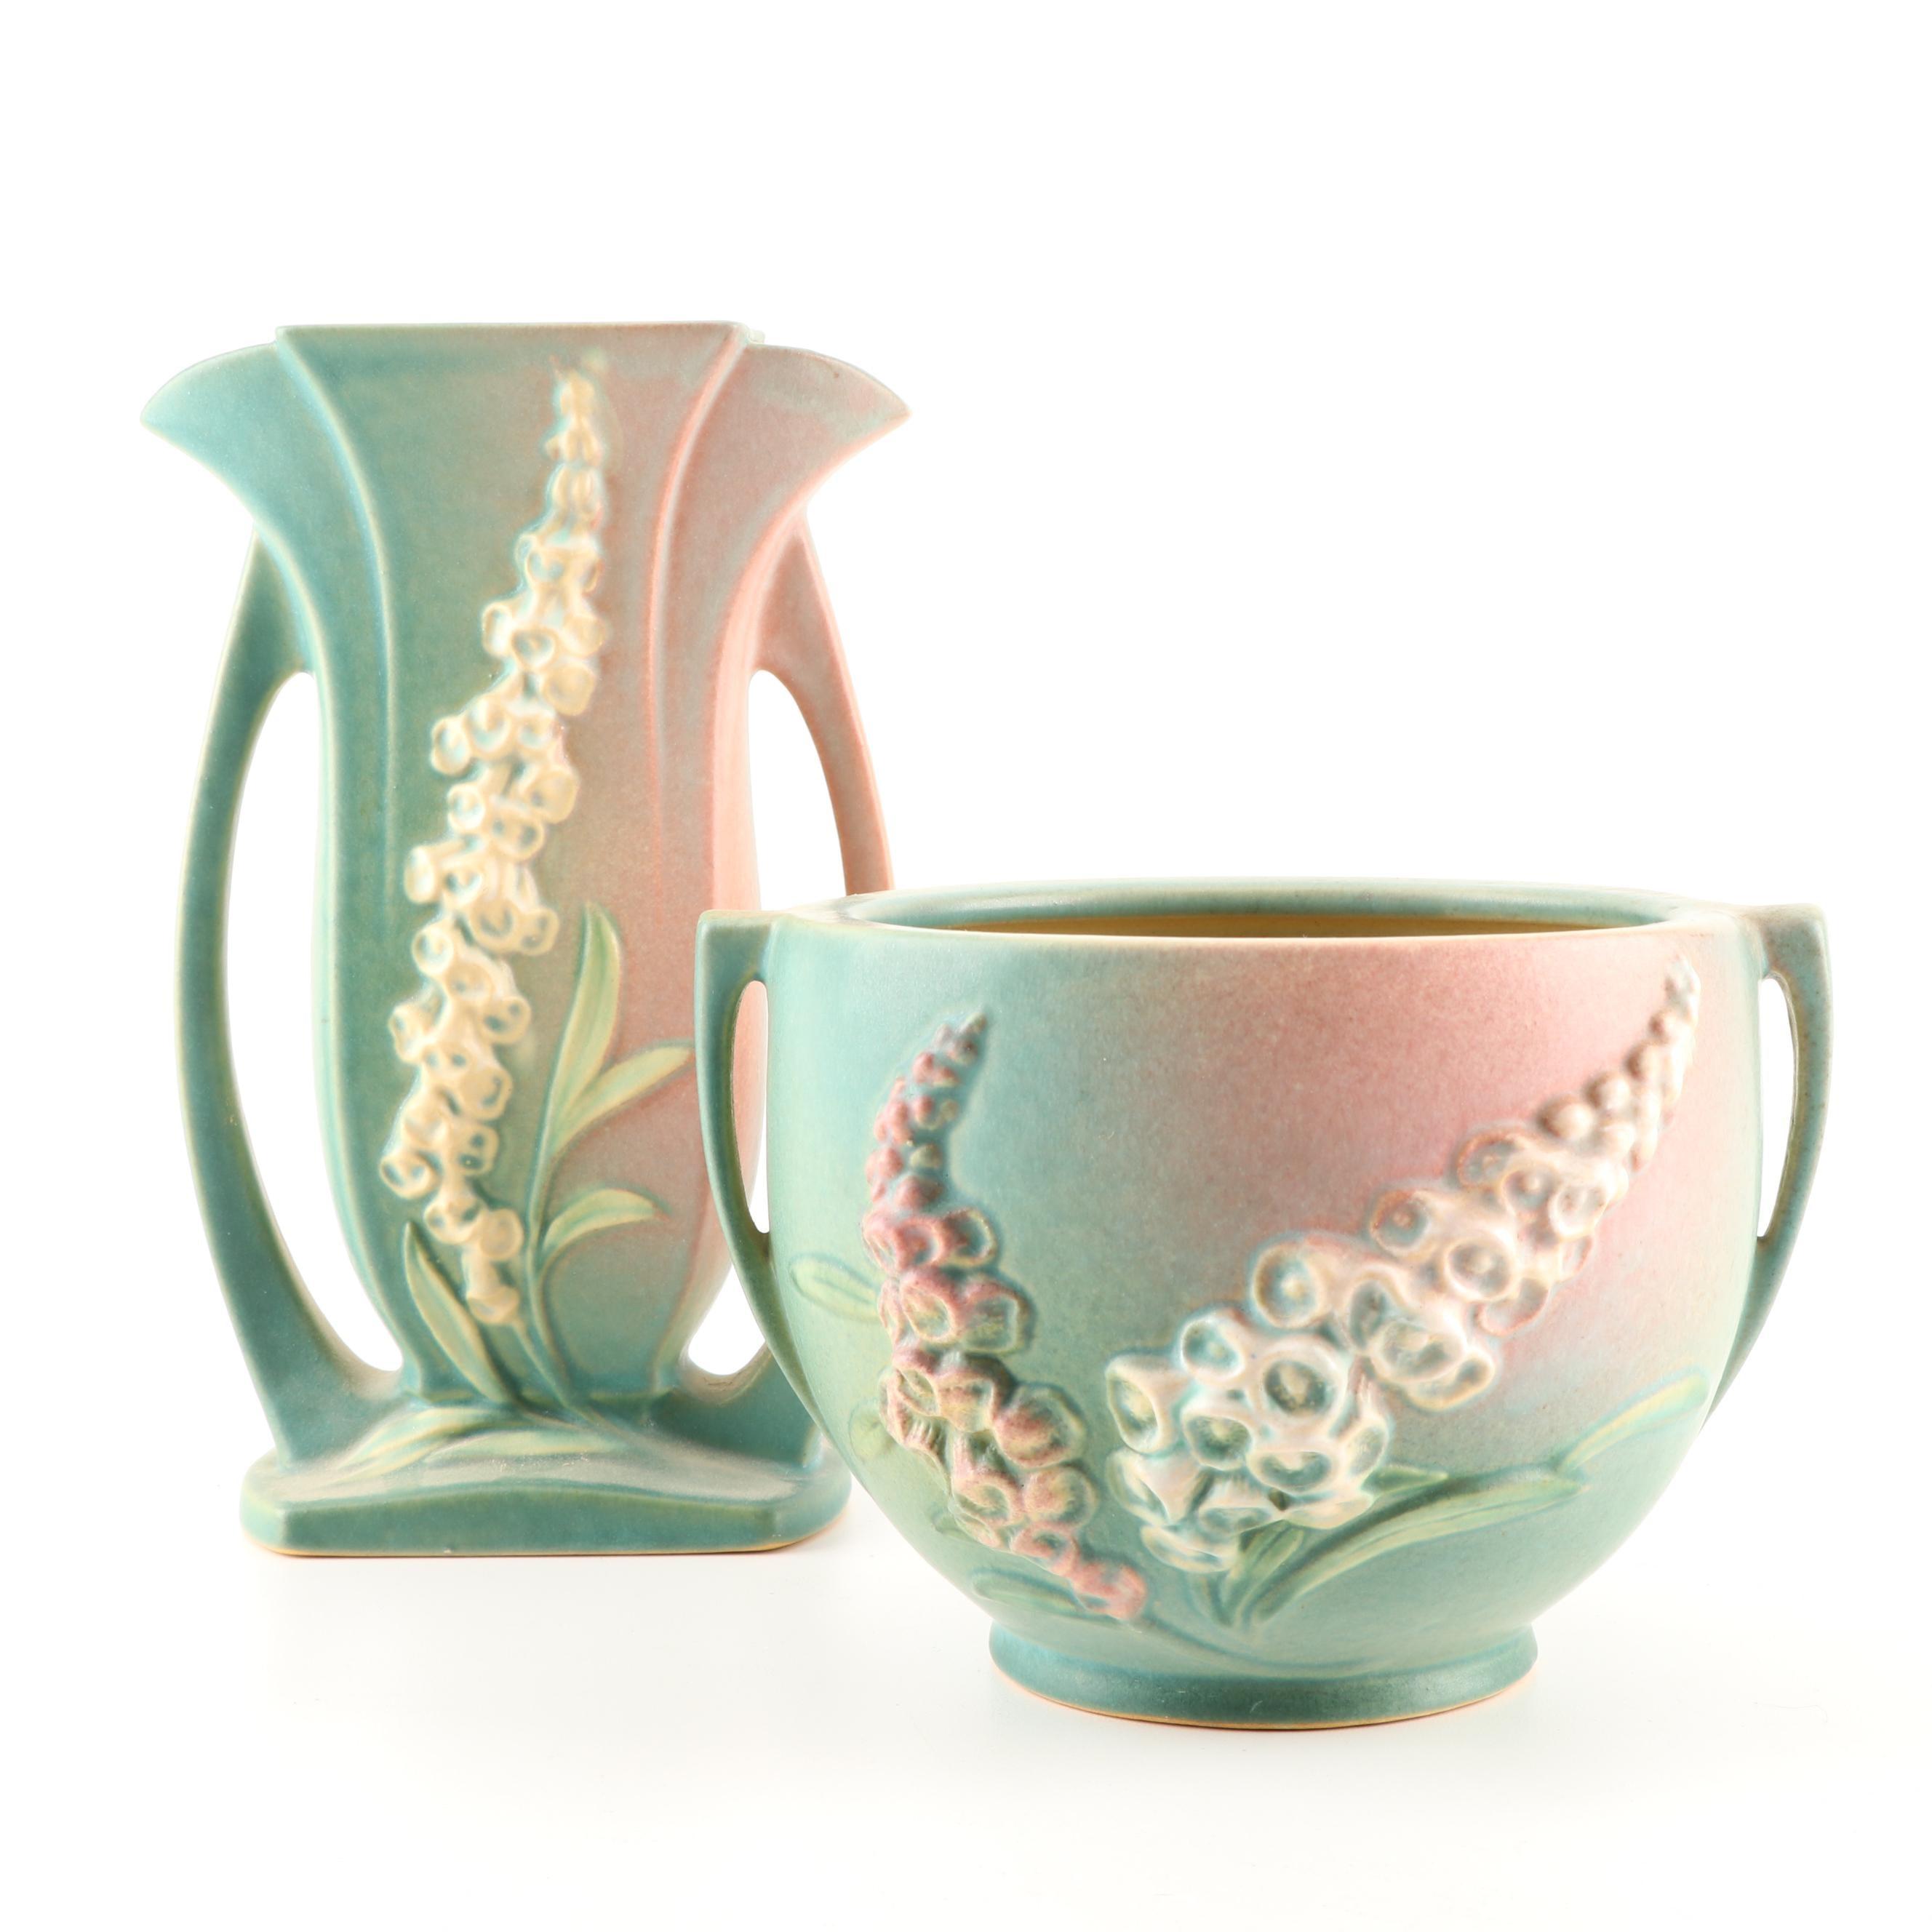 "Roseville Pottery ""Foxglove"" Vases, circa 1942"